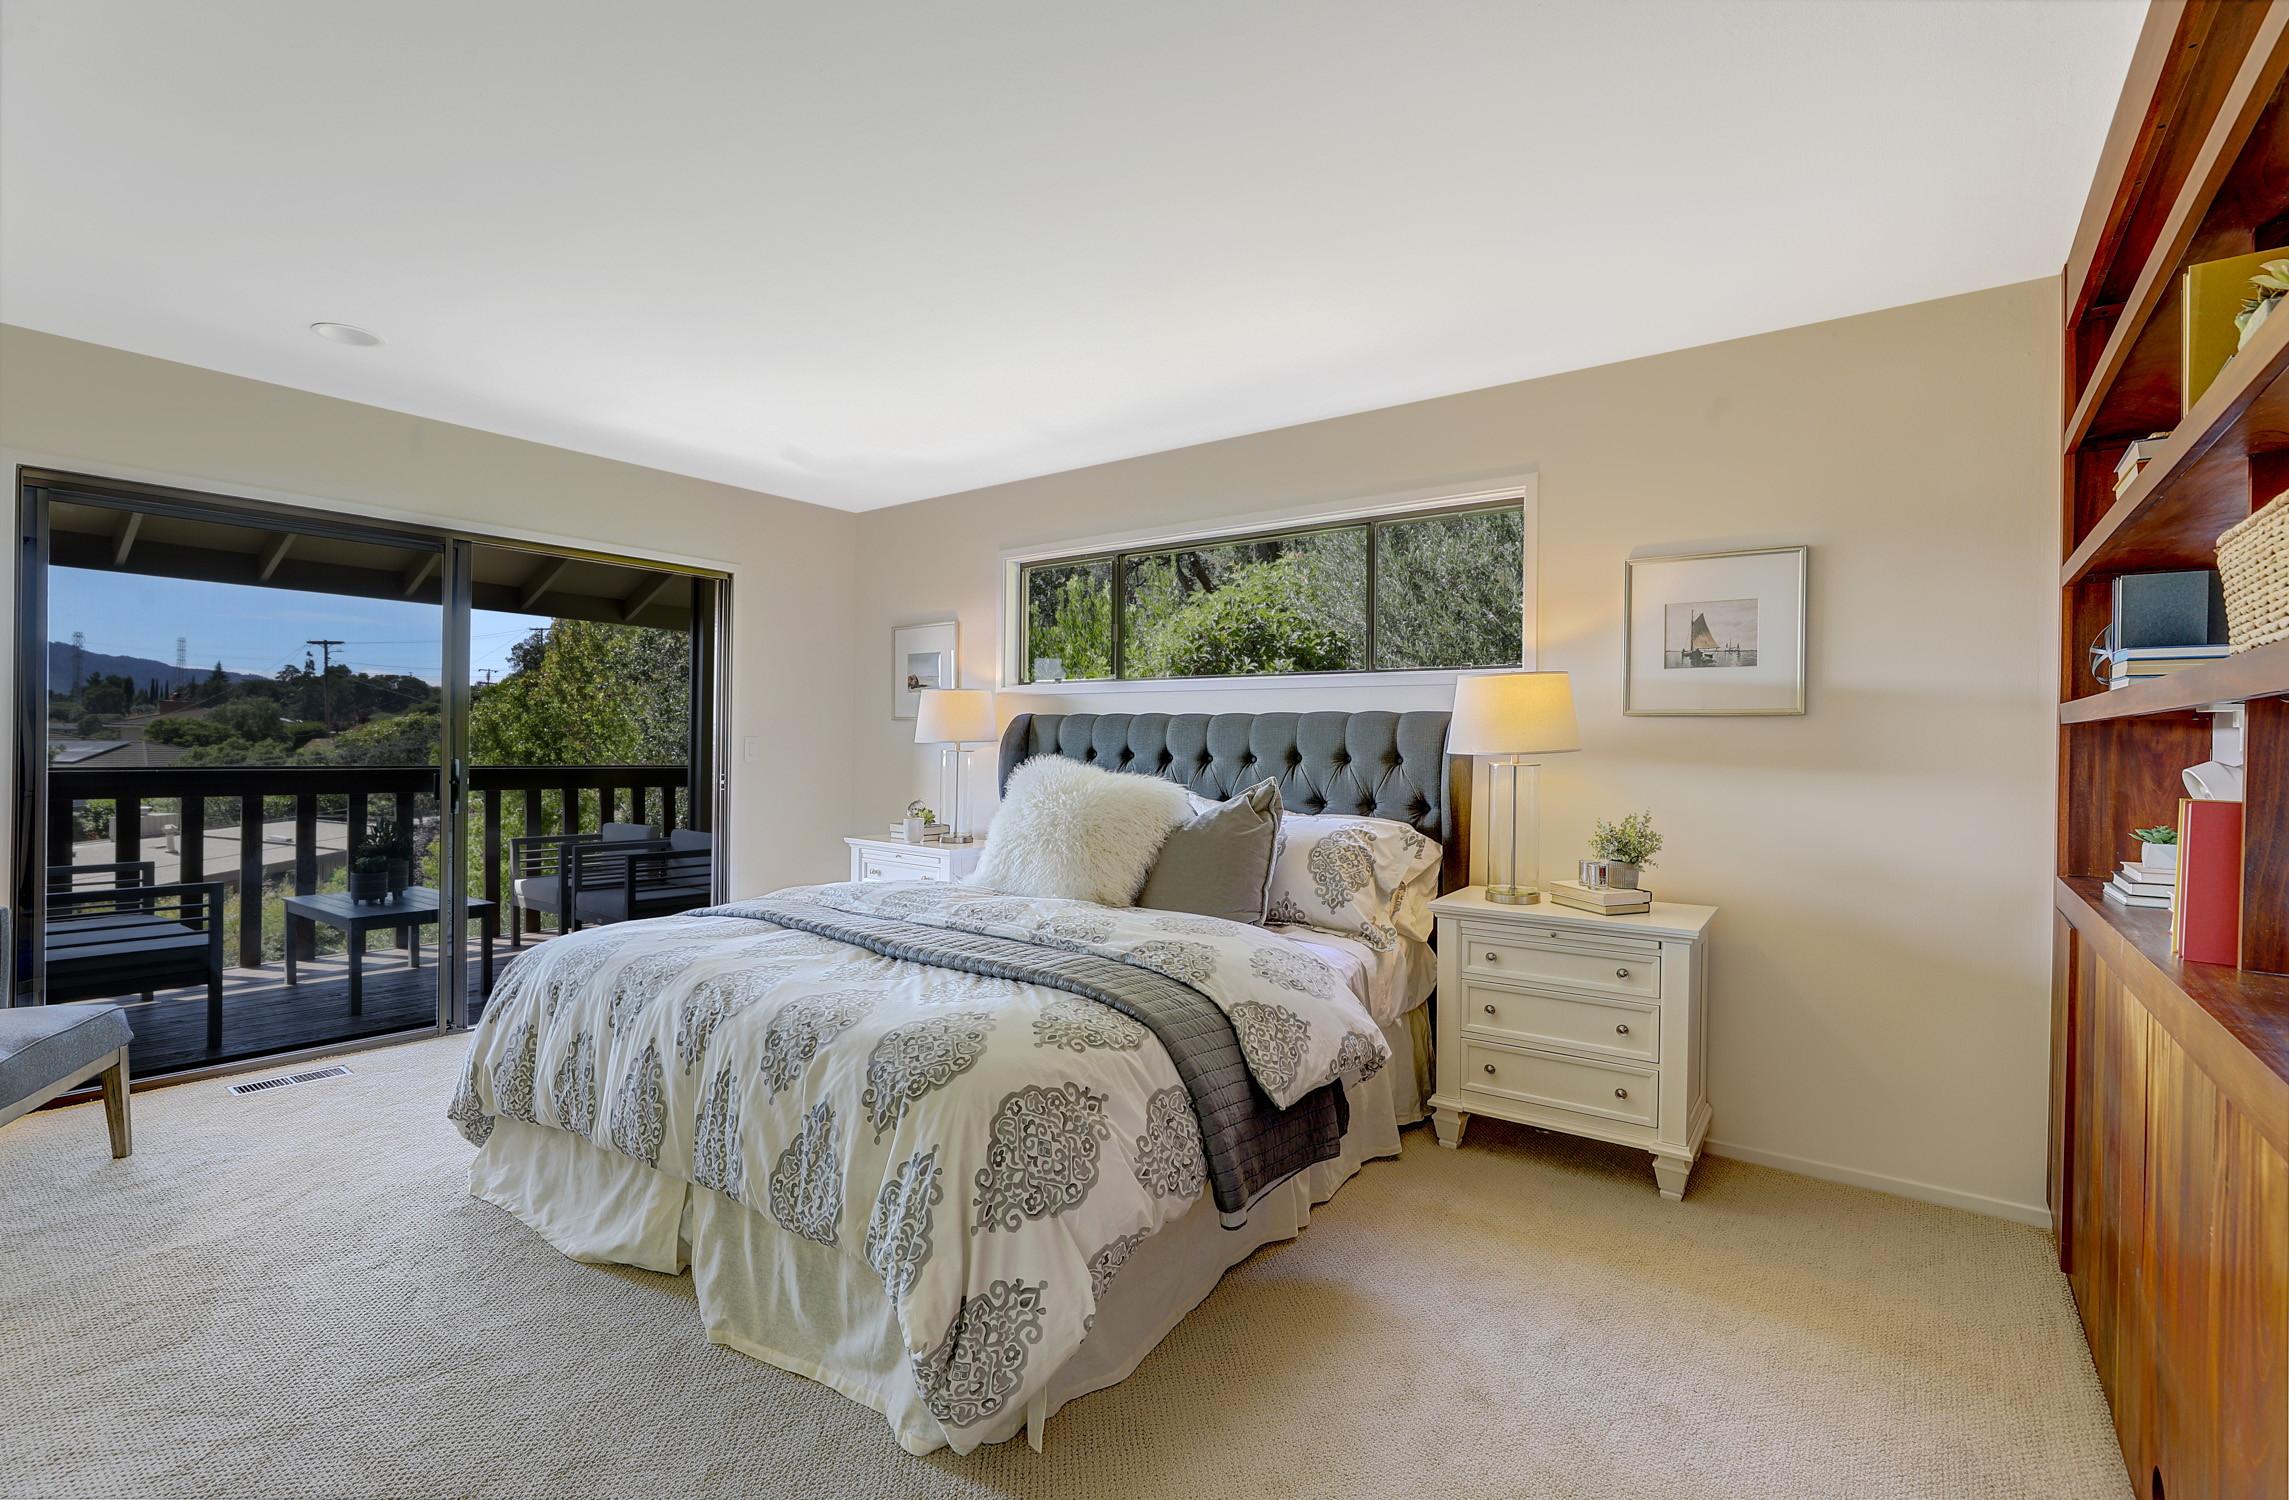 16Dorian 36 MLSSan Rafael Real Estate - Listed by Julia Fitzpatrick + Allie Fornesi Team Own Marin County .jpg